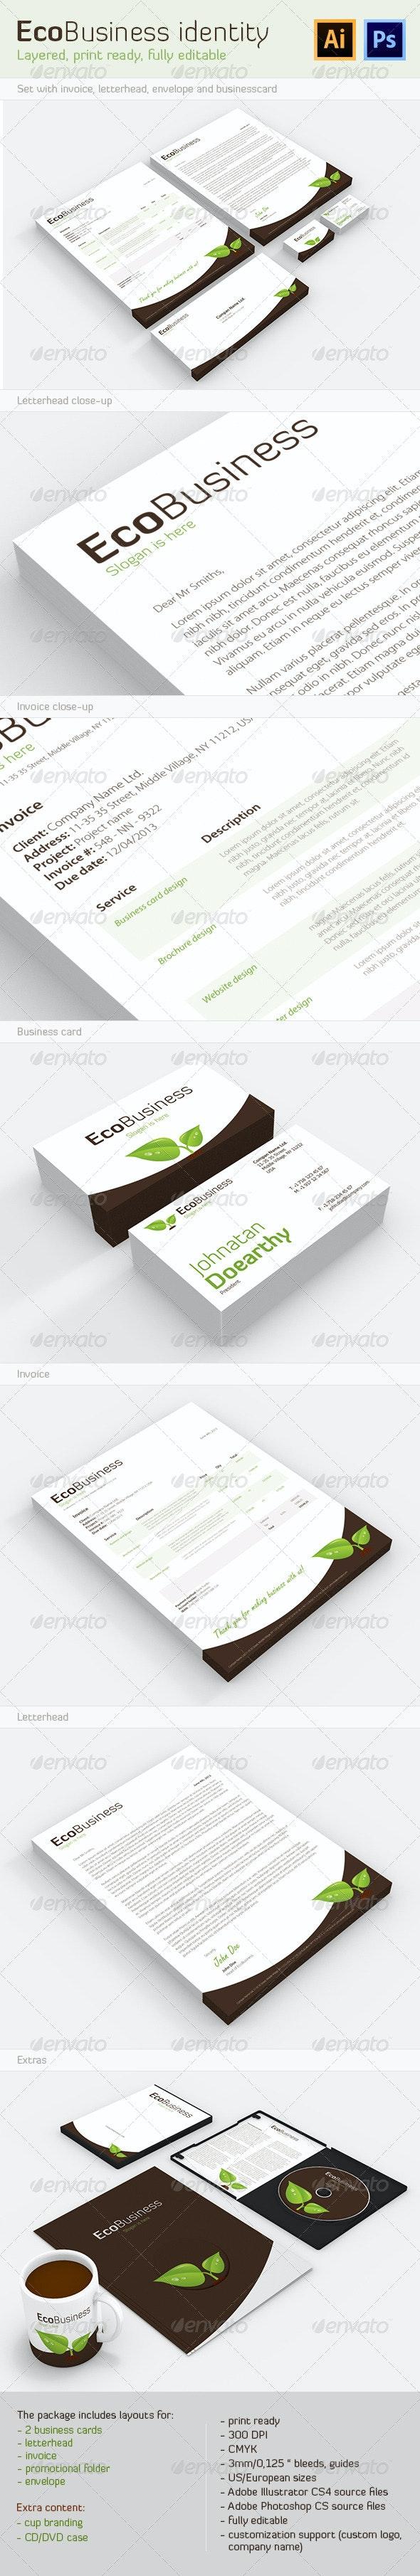 EcoBusiness Corporate Identity - Stationery Print Templates